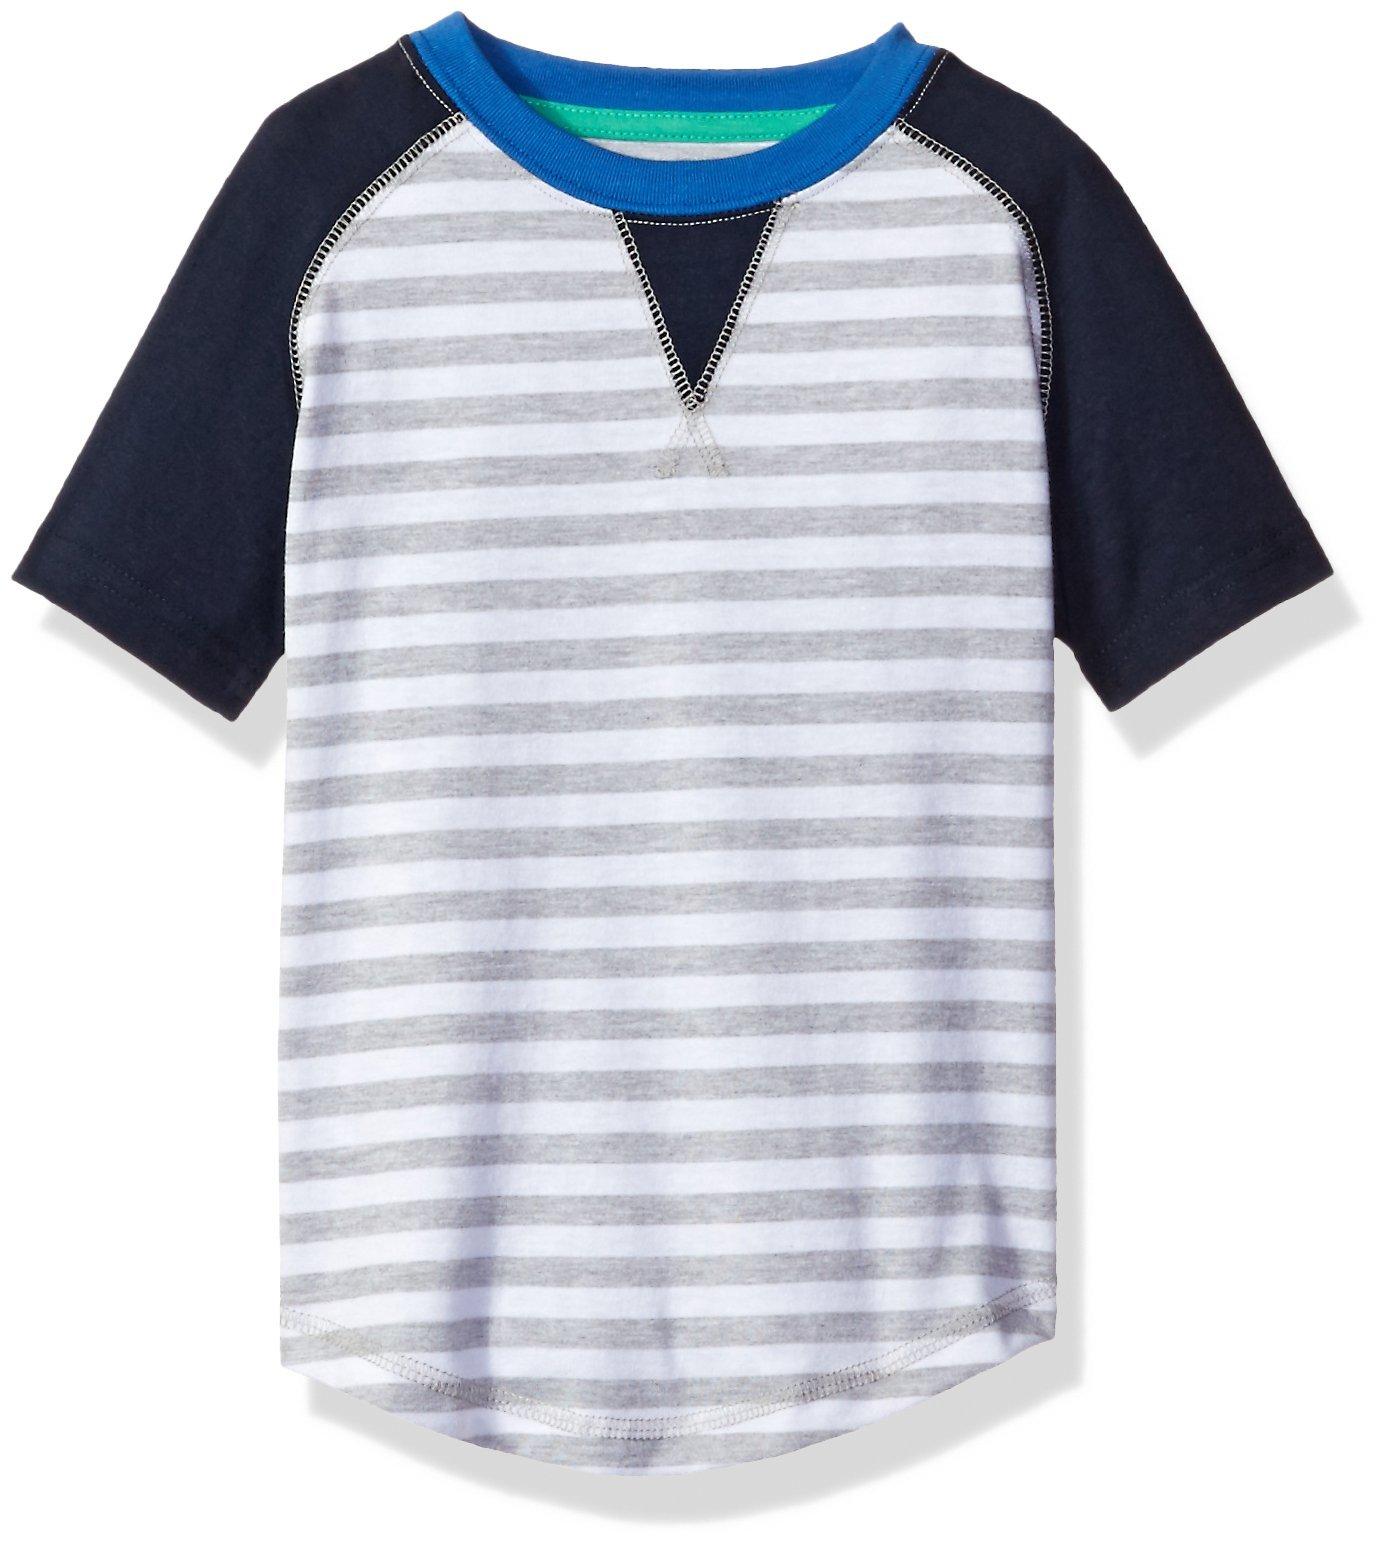 Sovereign Code Big Boys' Short Raglan Tee with Striped Print, White Stripe, X-Large